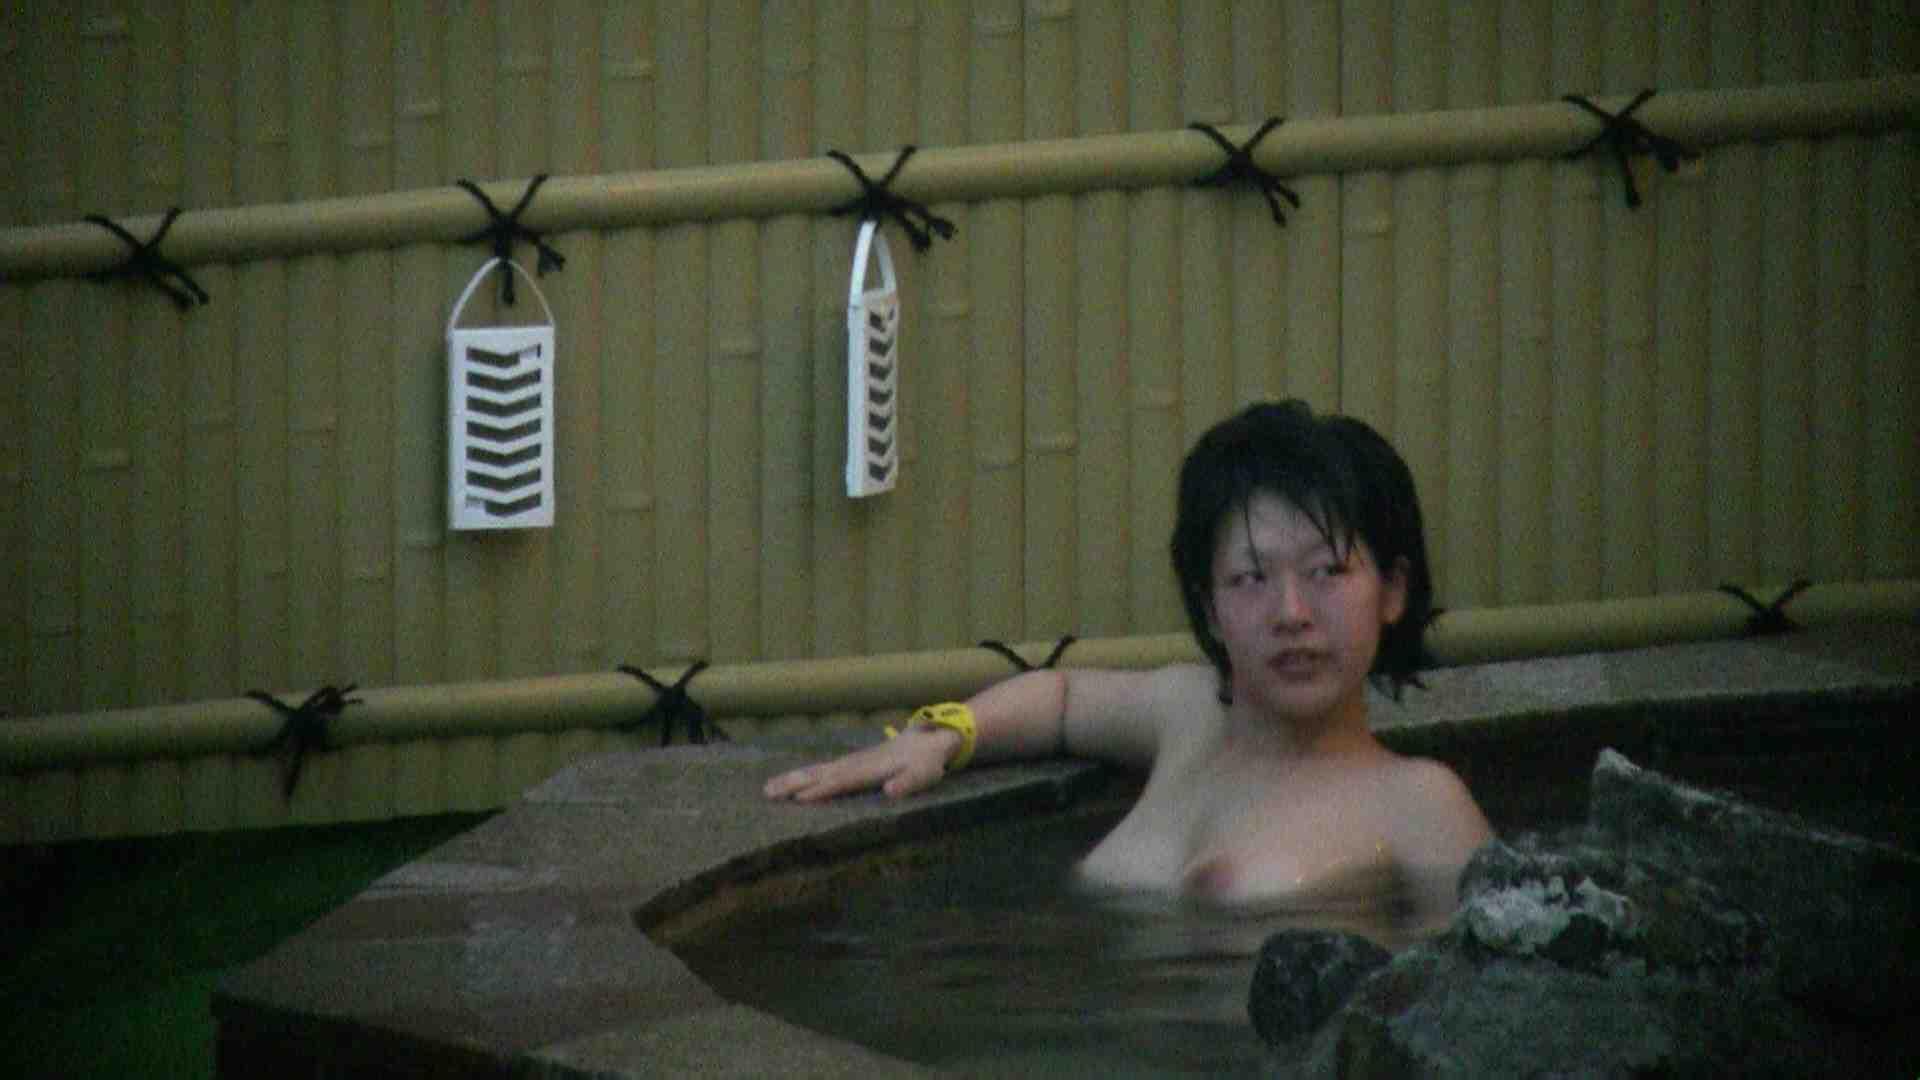 Aquaな露天風呂Vol.05【VIP】 綺麗なOLたち  63枚 27